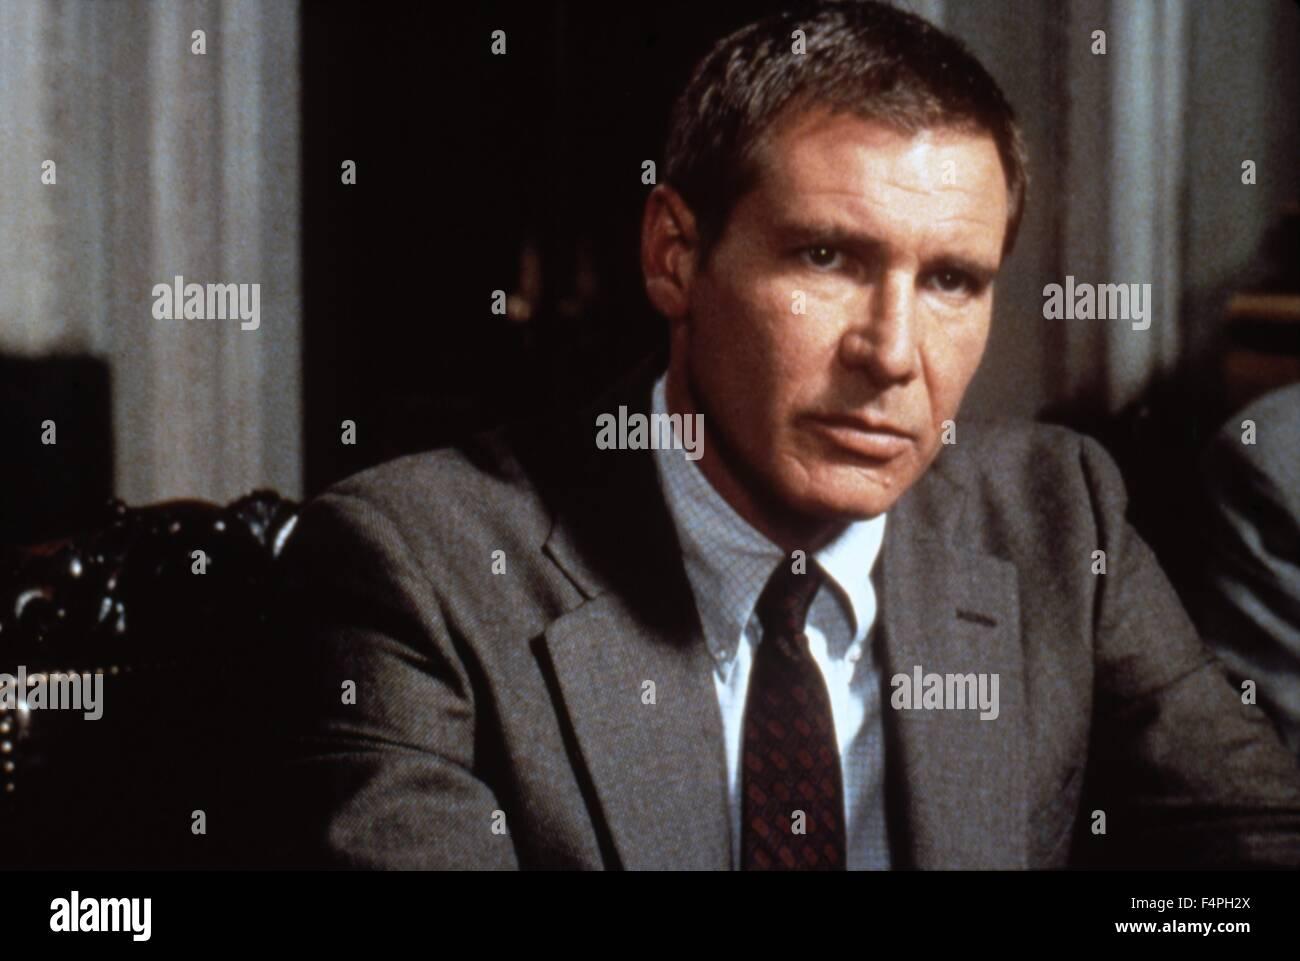 Elegant Harrison Ford / Presumed Innocent / 1990 Directed By Alan J Pakula With Presumed Innocent 1990